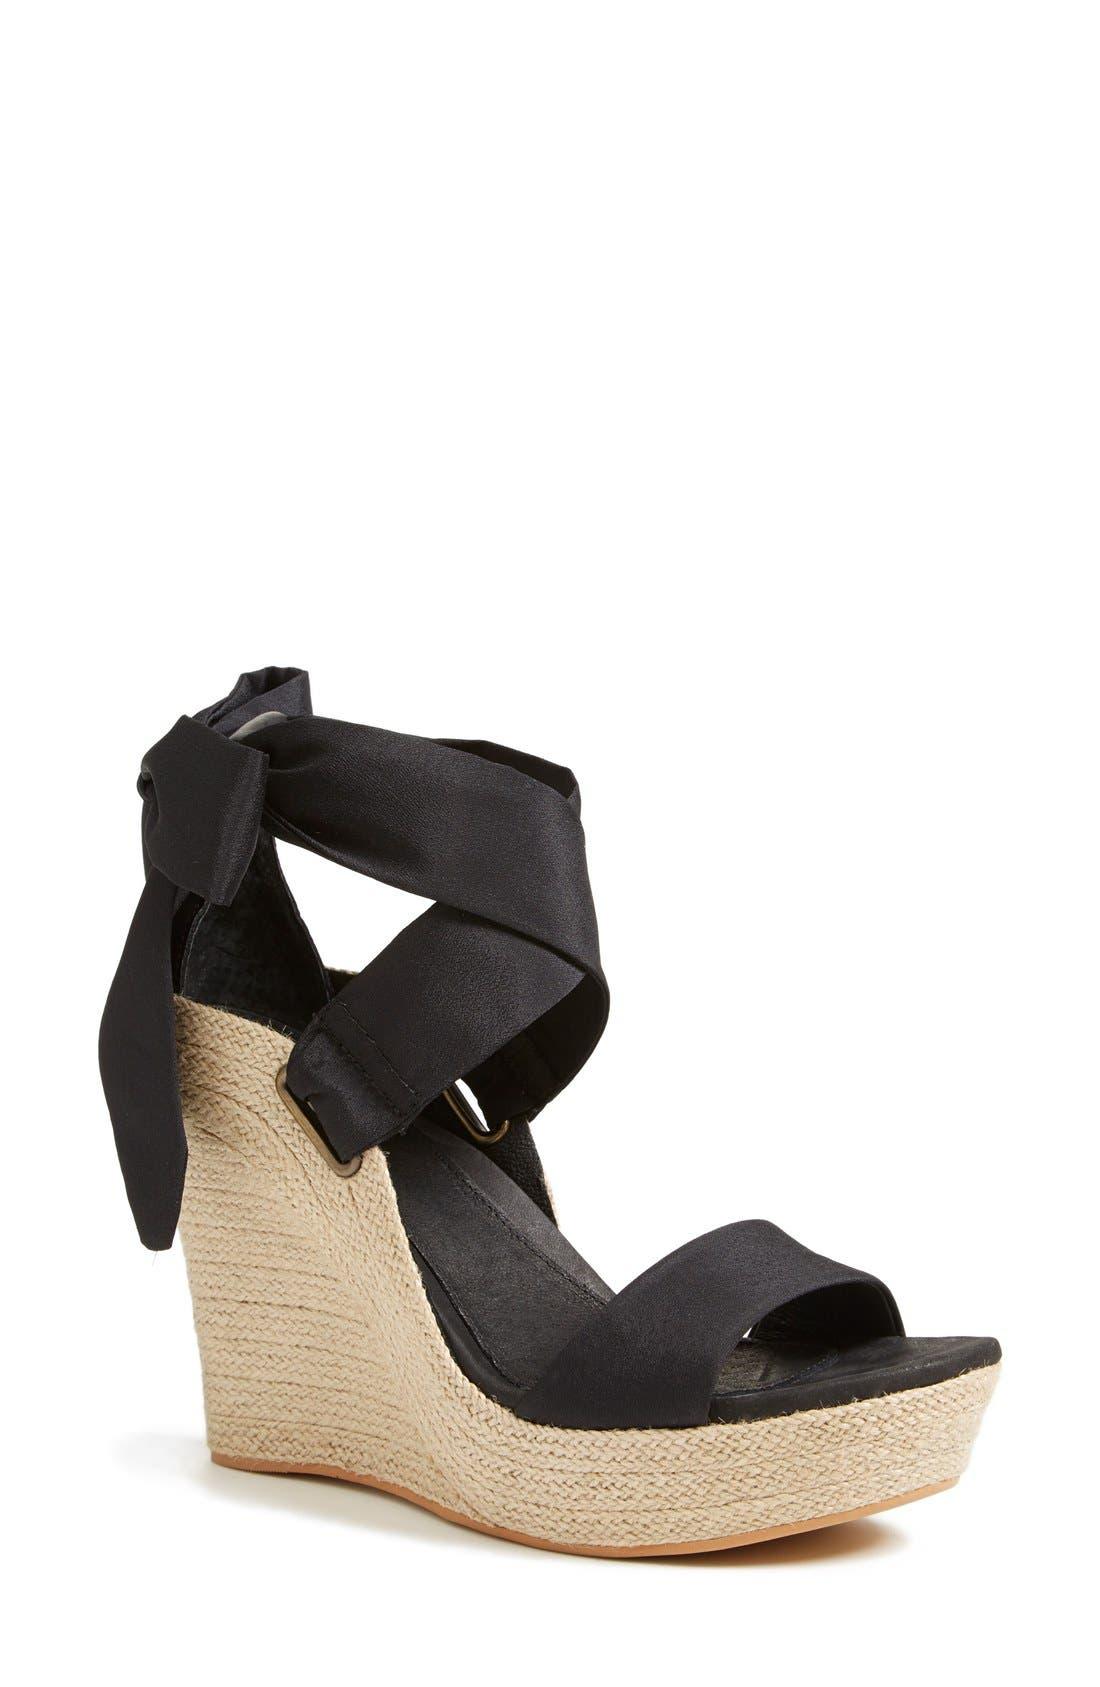 UGG<SUP>®</SUP> 'Jules' Platform Wedge Sandal, Main, color, 001